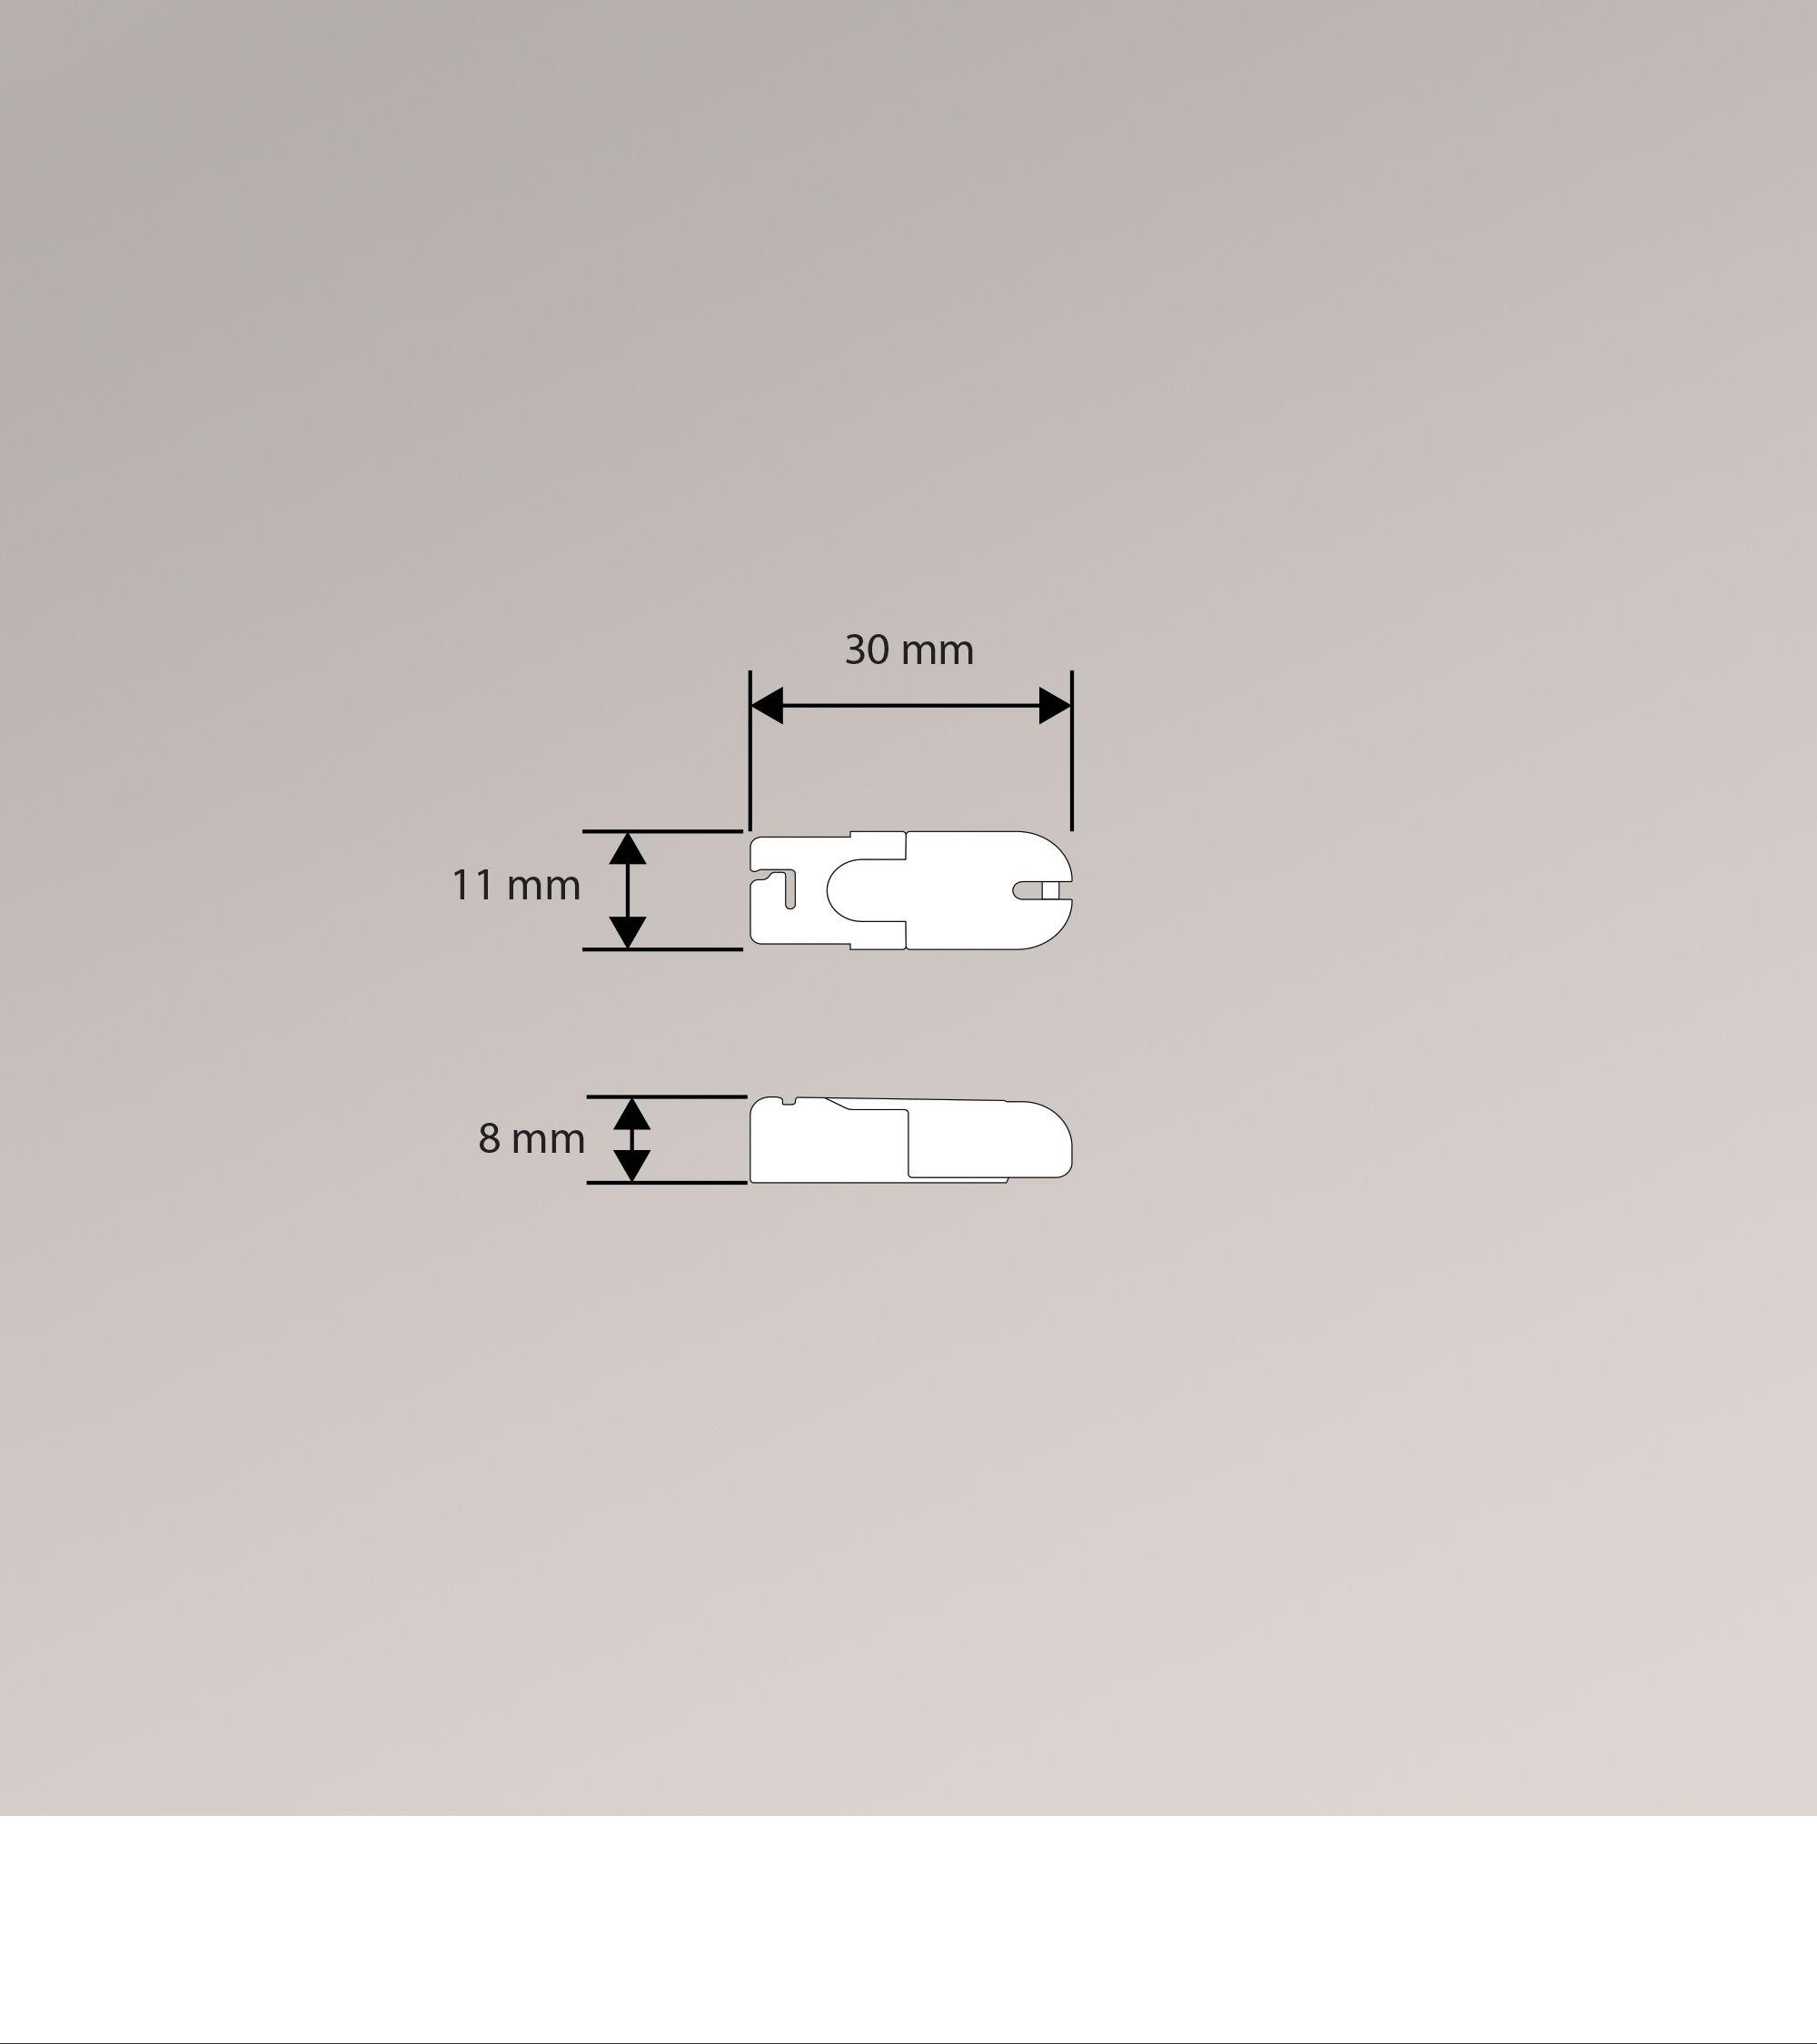 cosiflor klemmtrger fabulous trendy x klemmtrger plissee with befestigung plissee with cosiflor. Black Bedroom Furniture Sets. Home Design Ideas